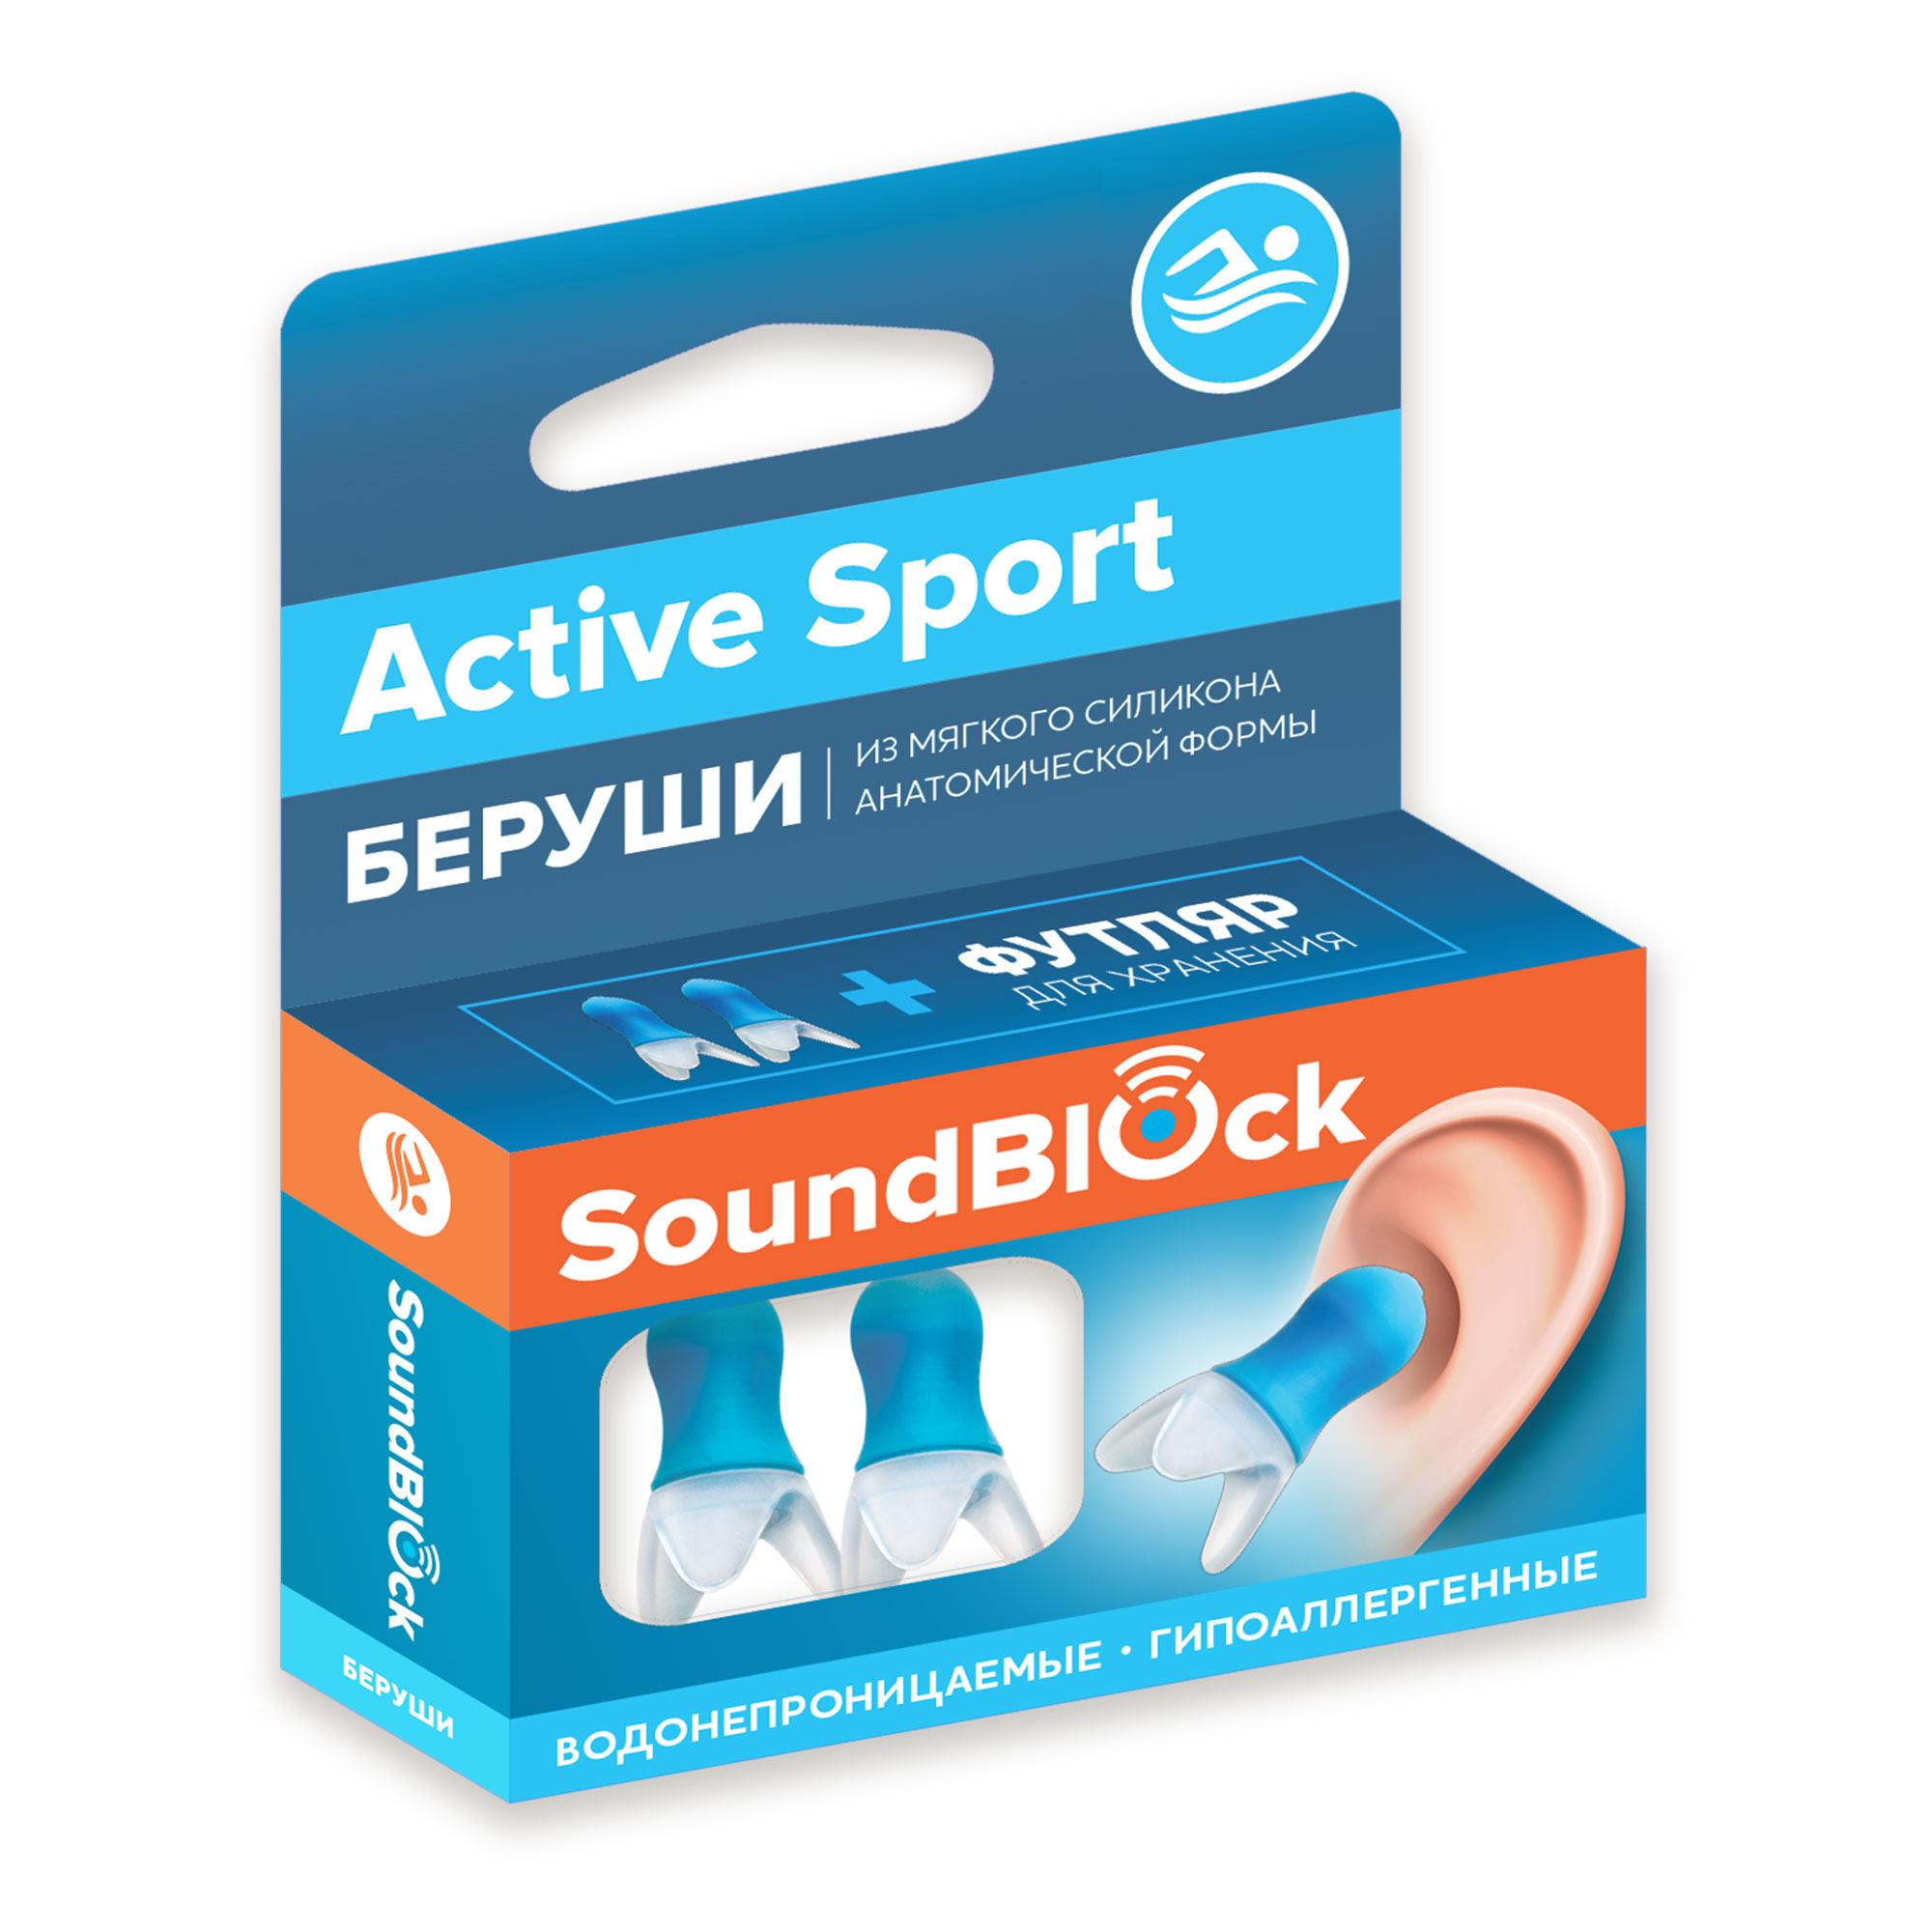 Беруши Soundblock Active Sport 2622-003